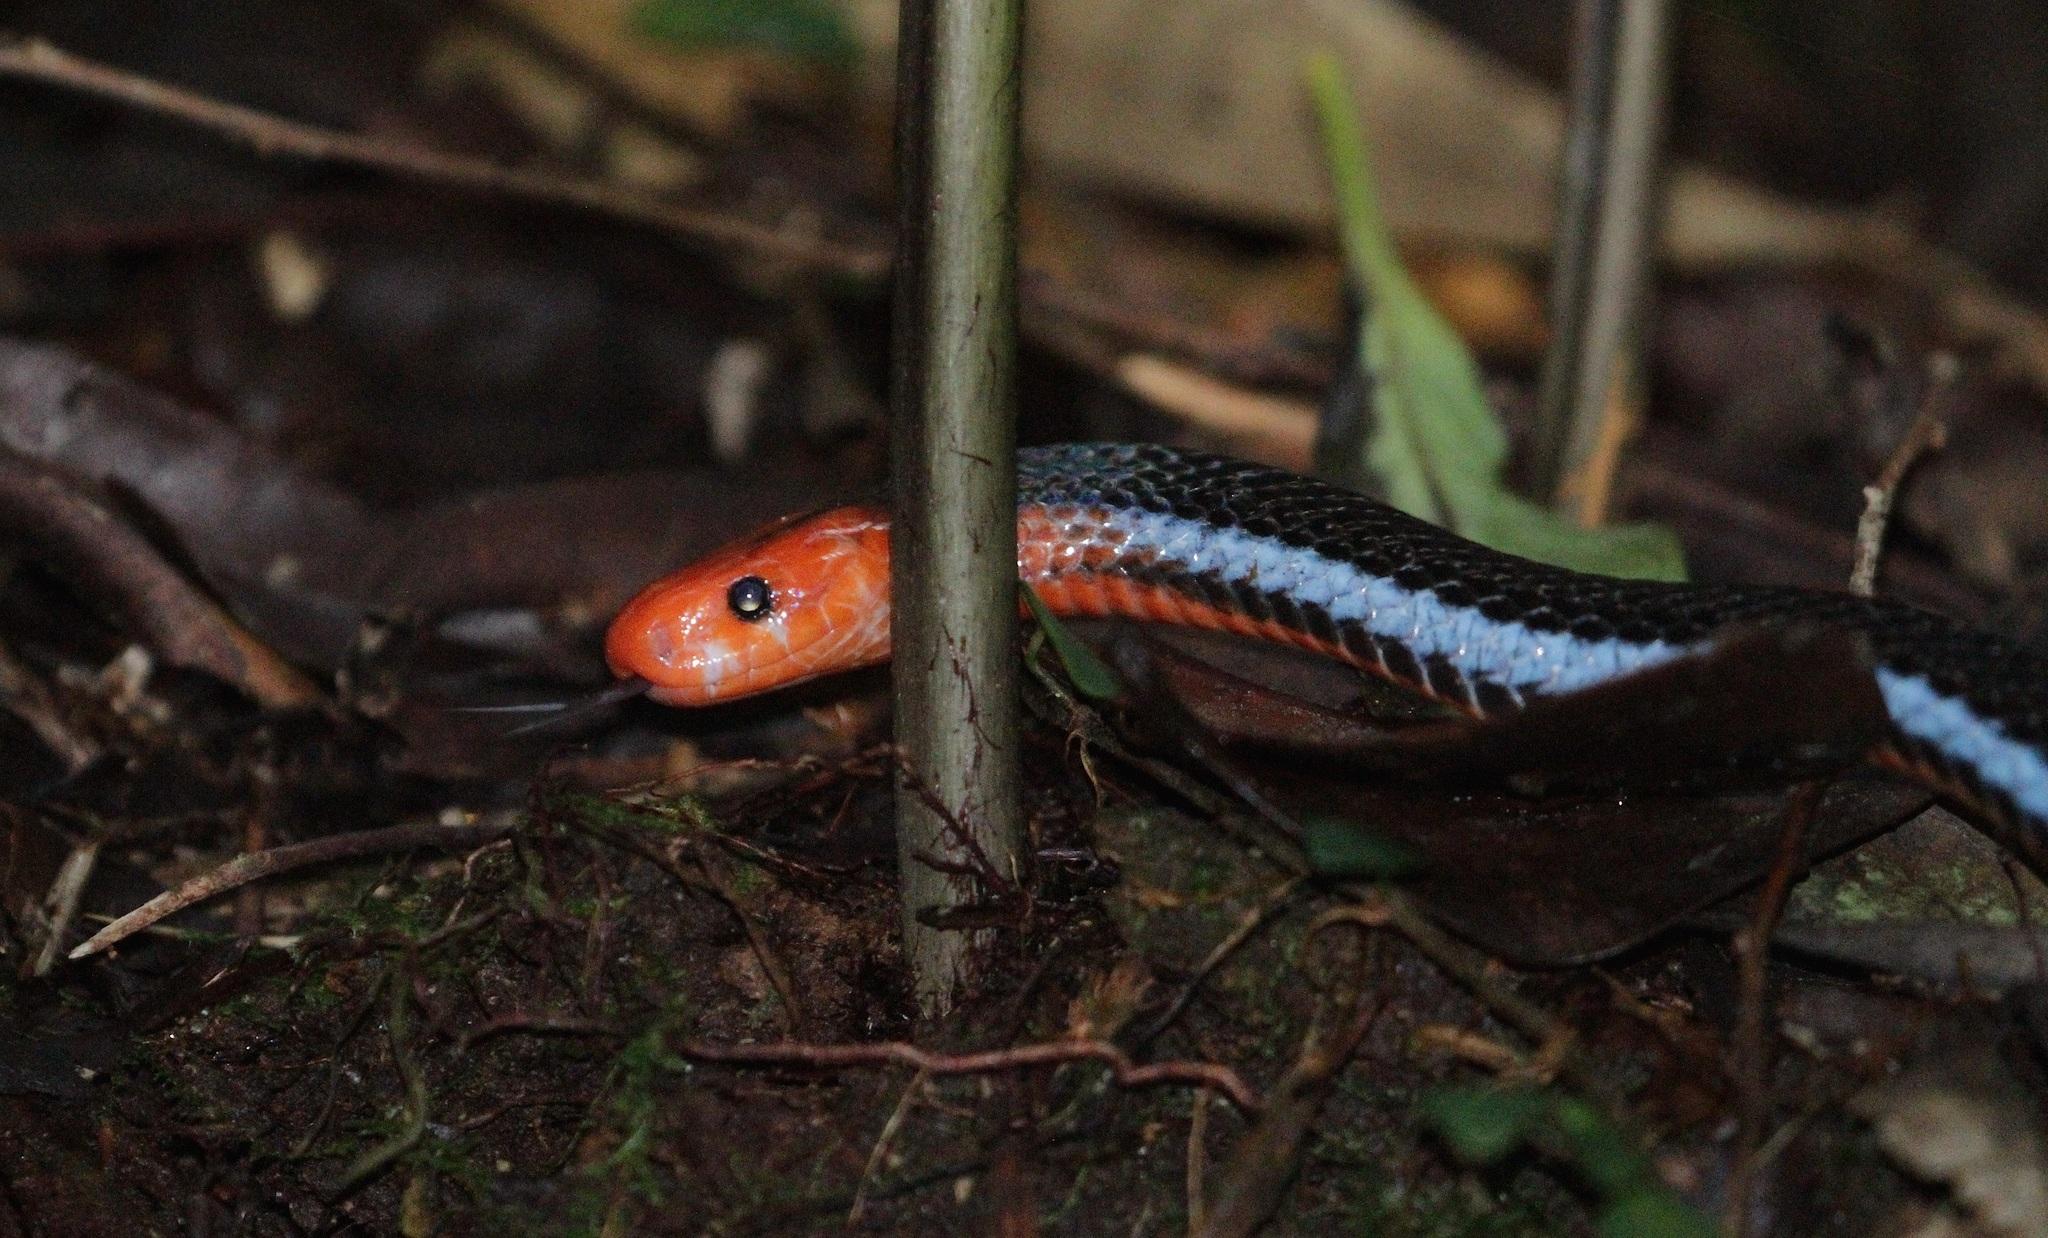 Image of Blue Coral Snake